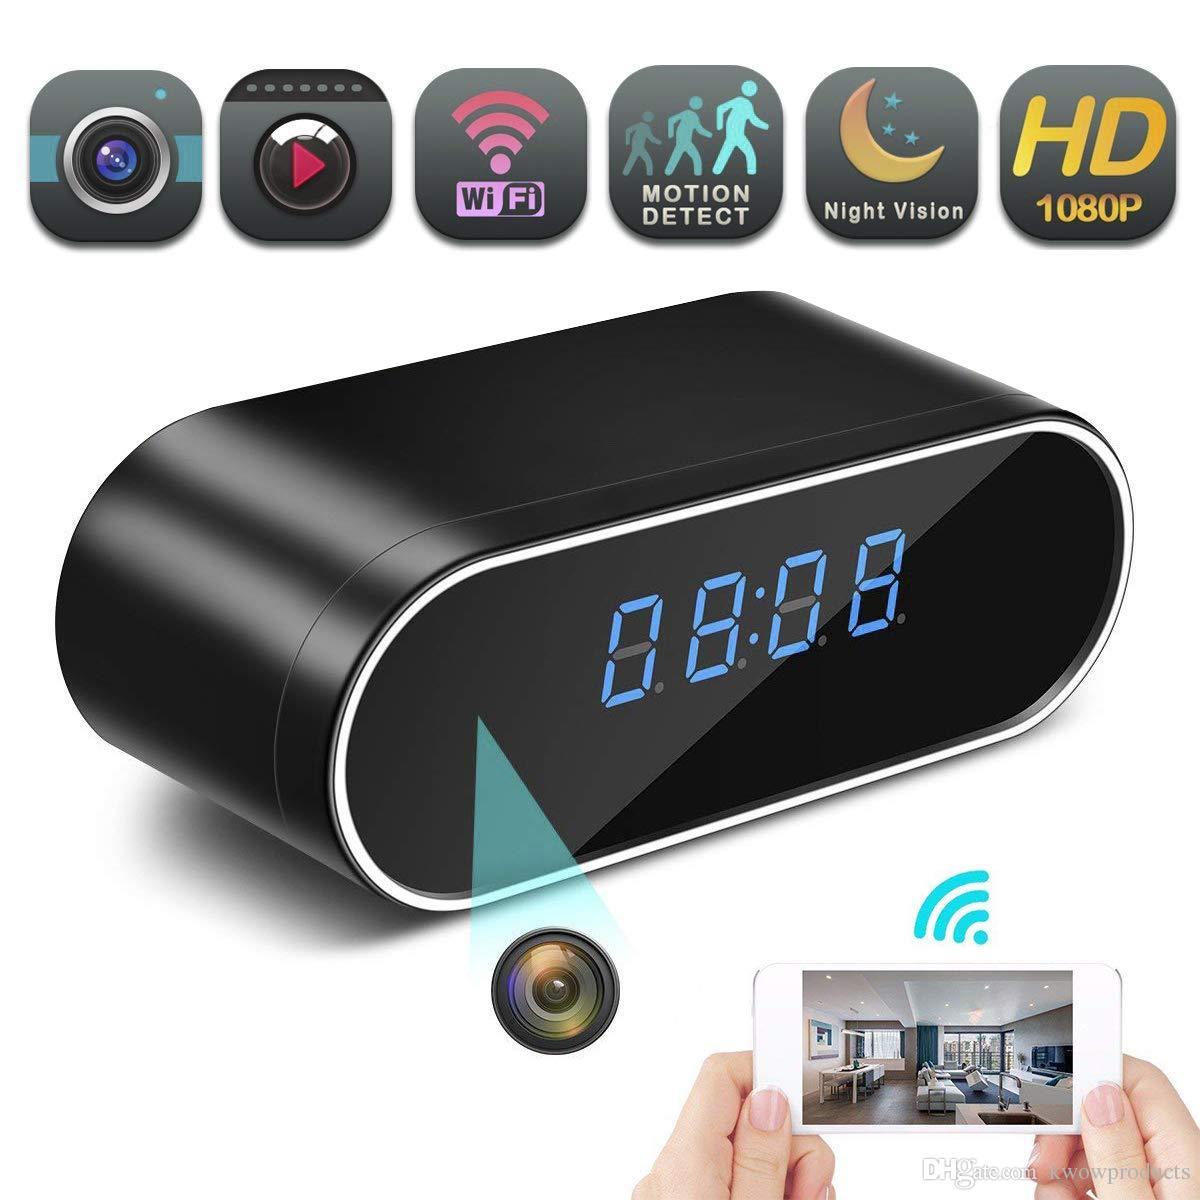 Hidden Spy Wireless Camera, 1080P Clock Hidden Camera Wireless IP Surveillance Camera for Home Security